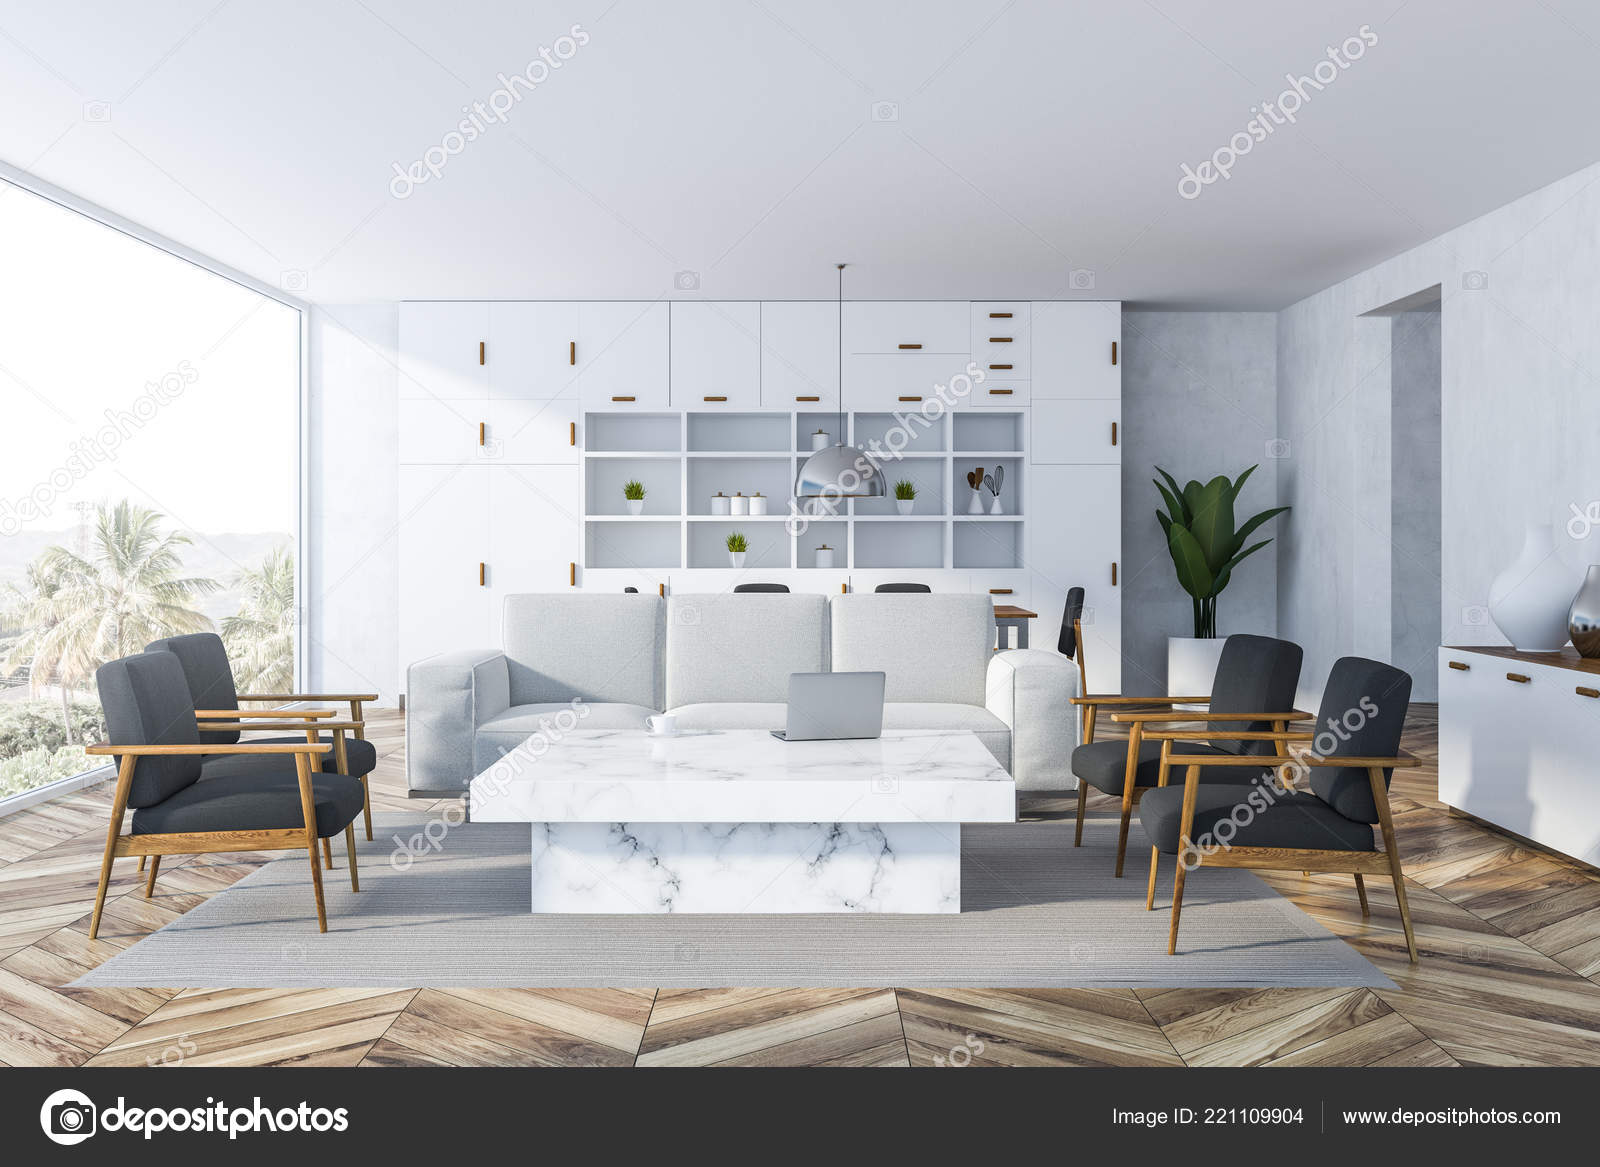 Remarkable Interior White Living Room White Walls Wooden Floor Gamerscity Chair Design For Home Gamerscityorg